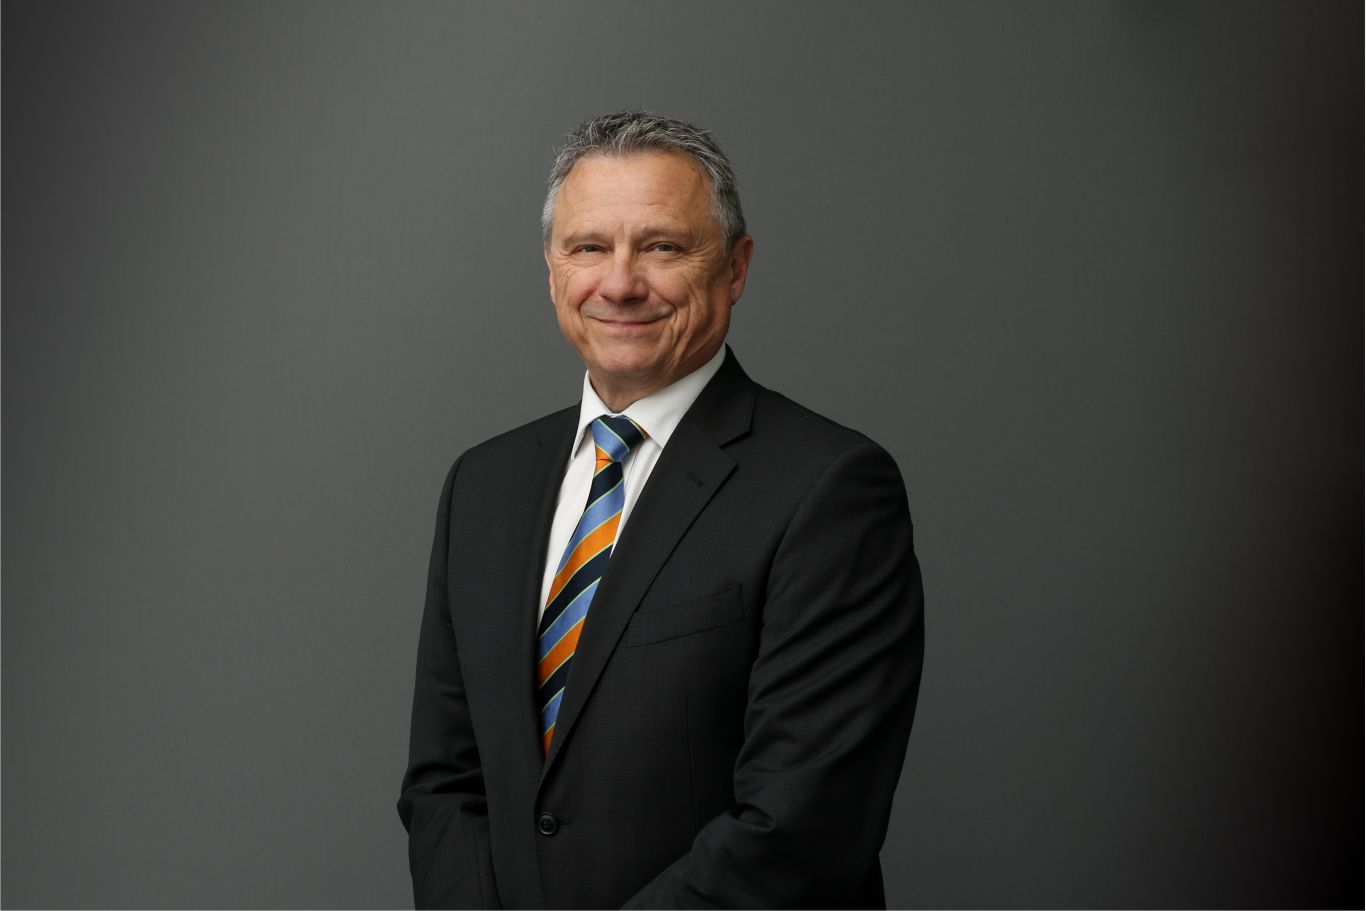 John Lipkiewicz